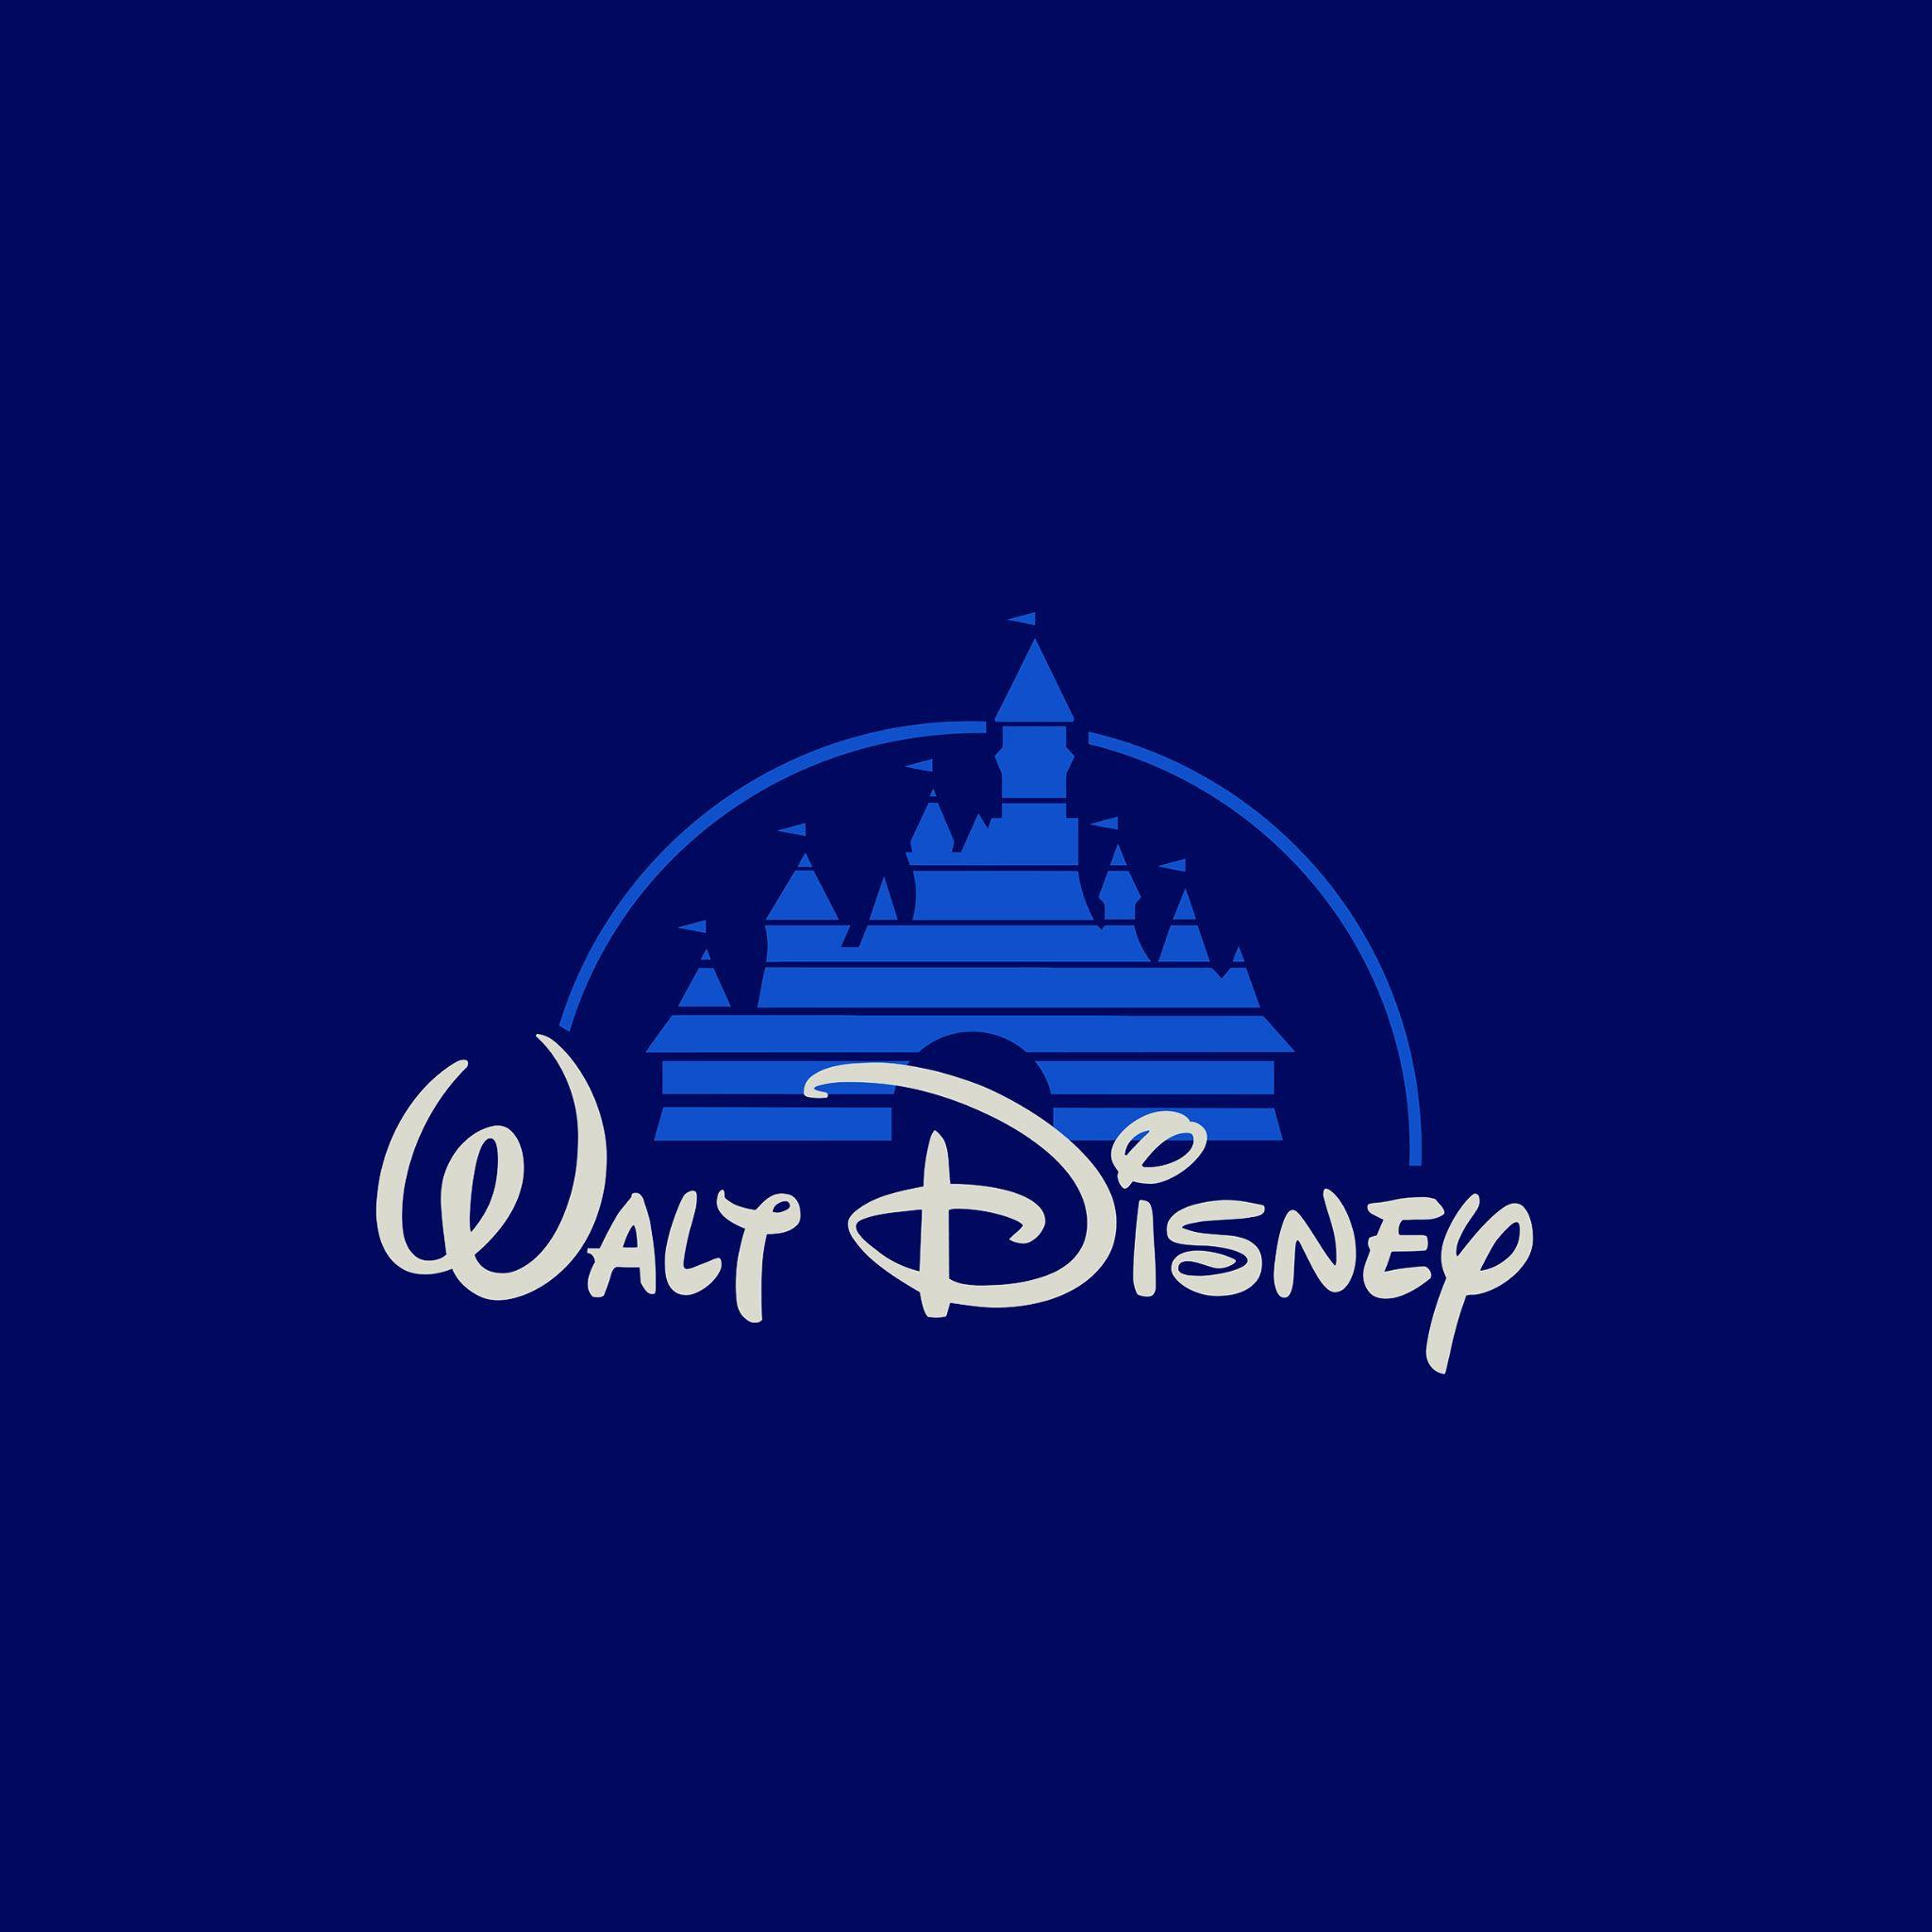 Walt Disney Logo Art IPad Air Wallpaper